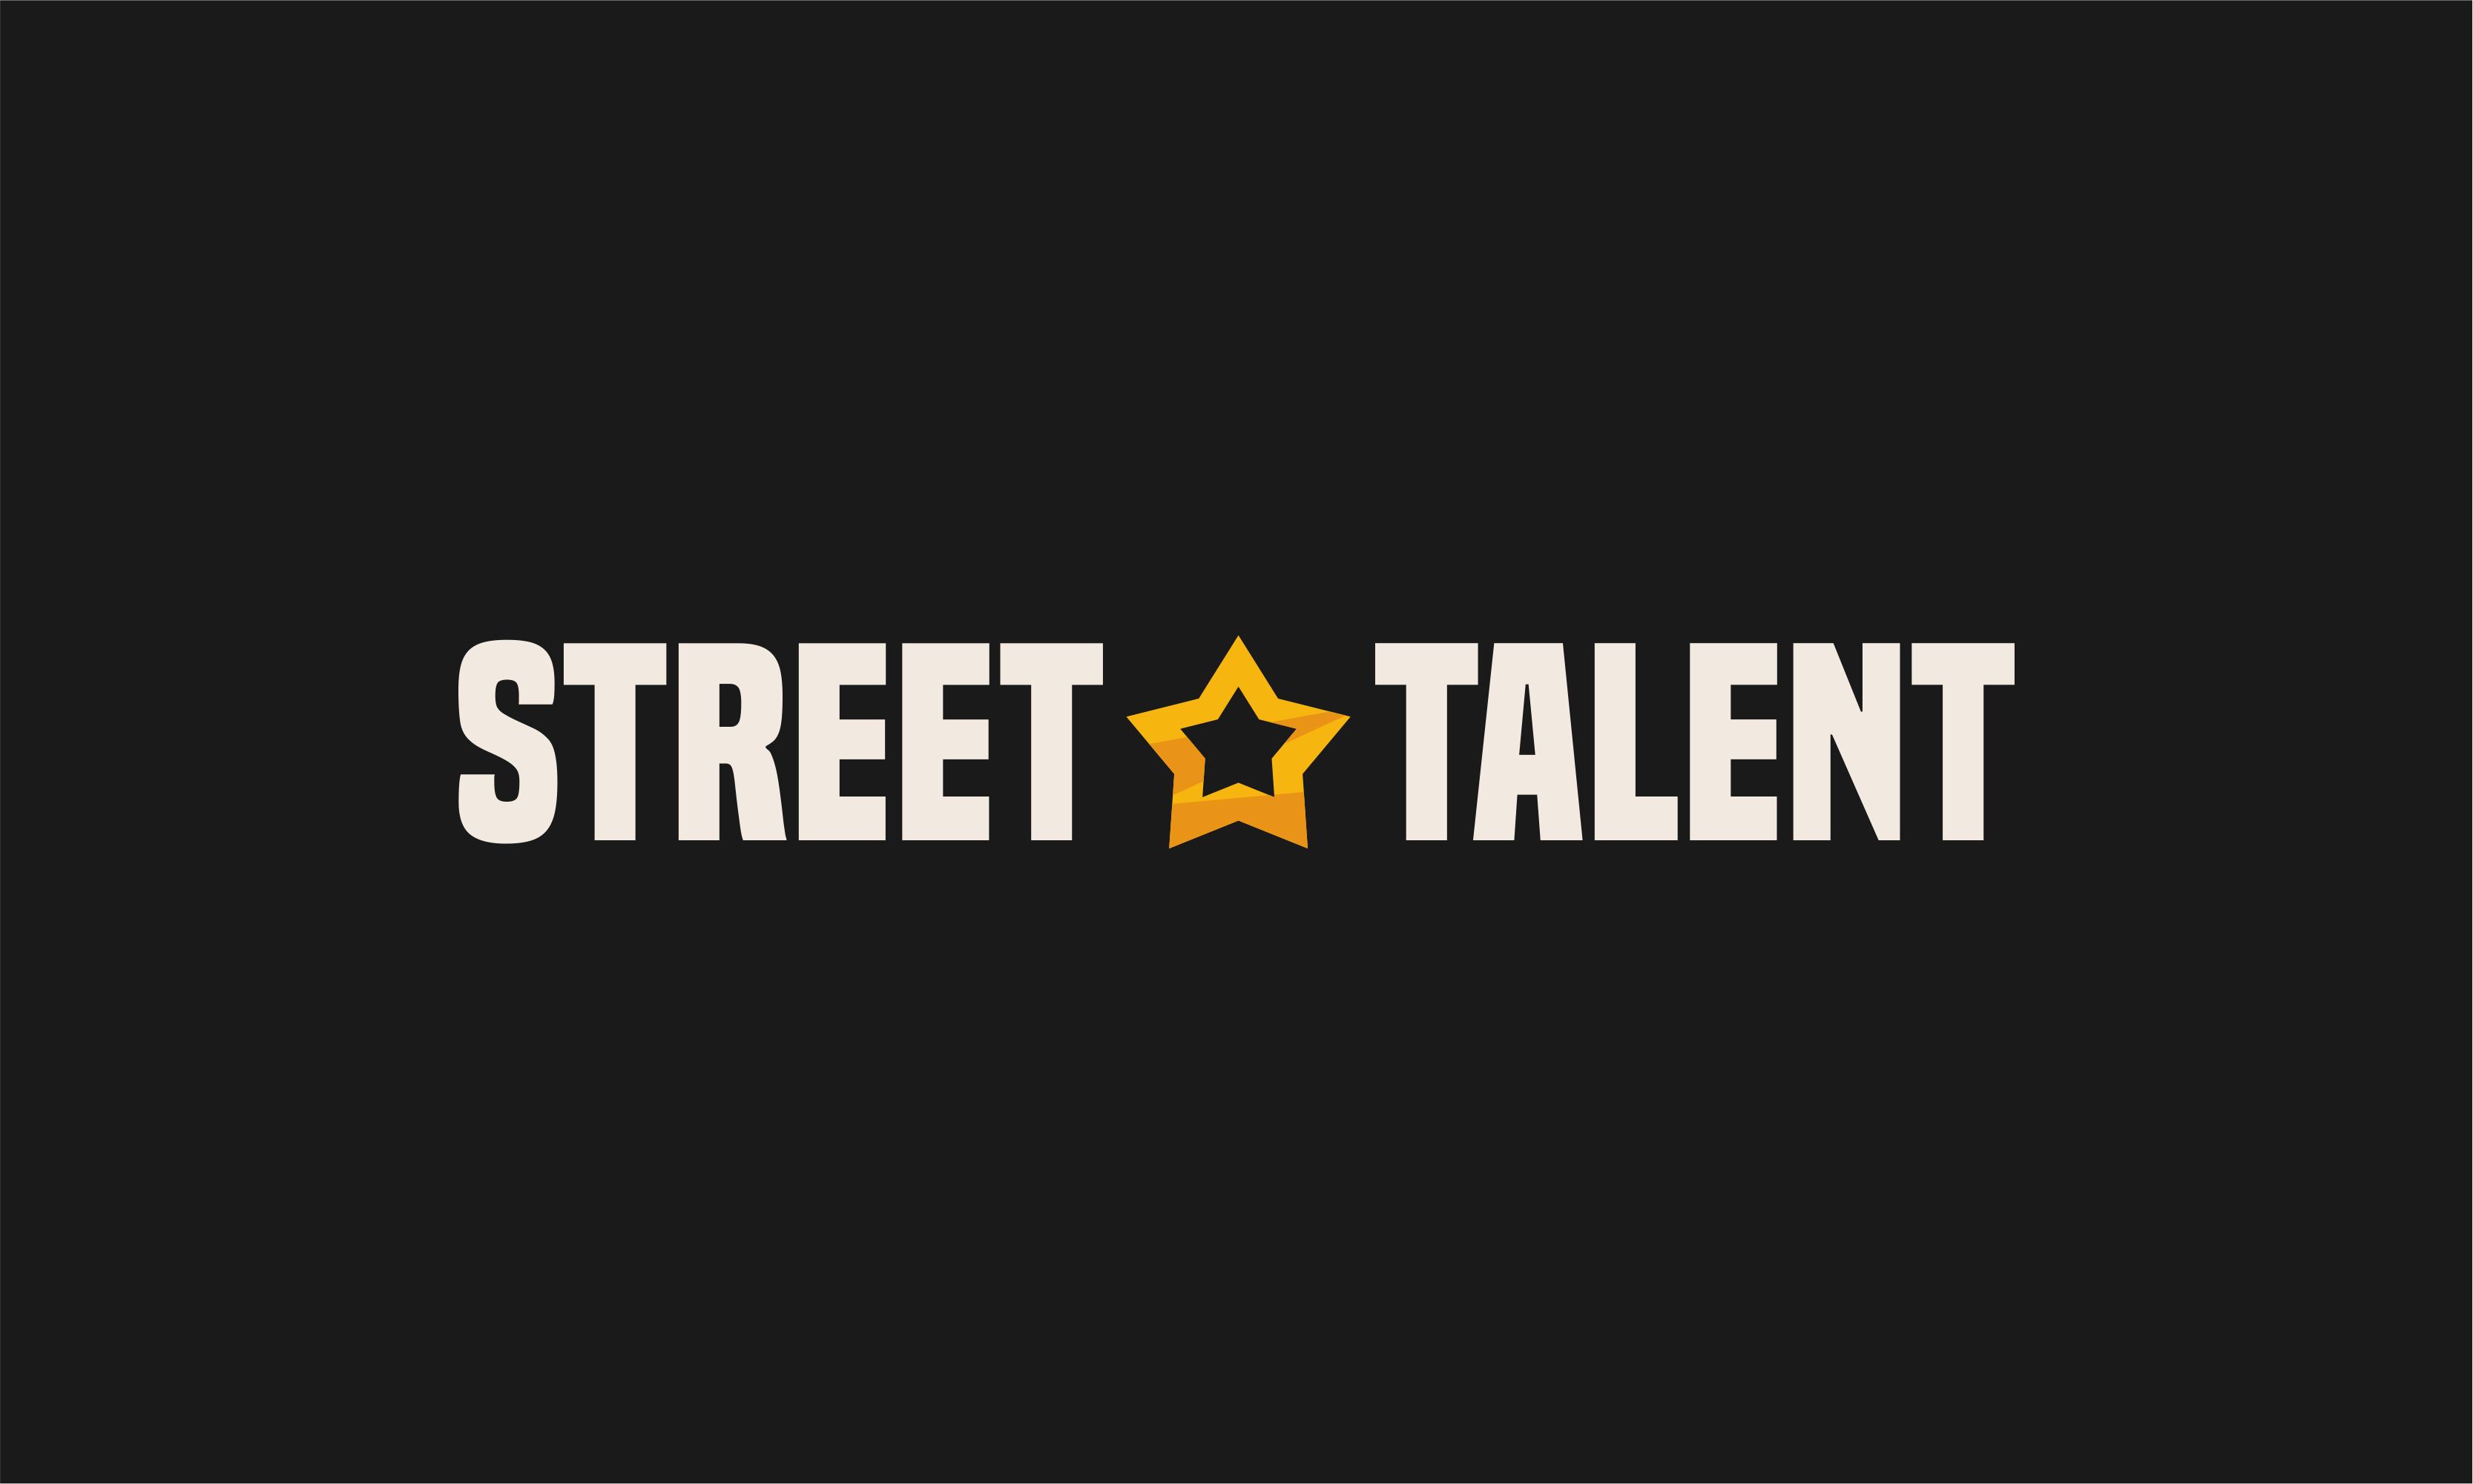 Streettalent